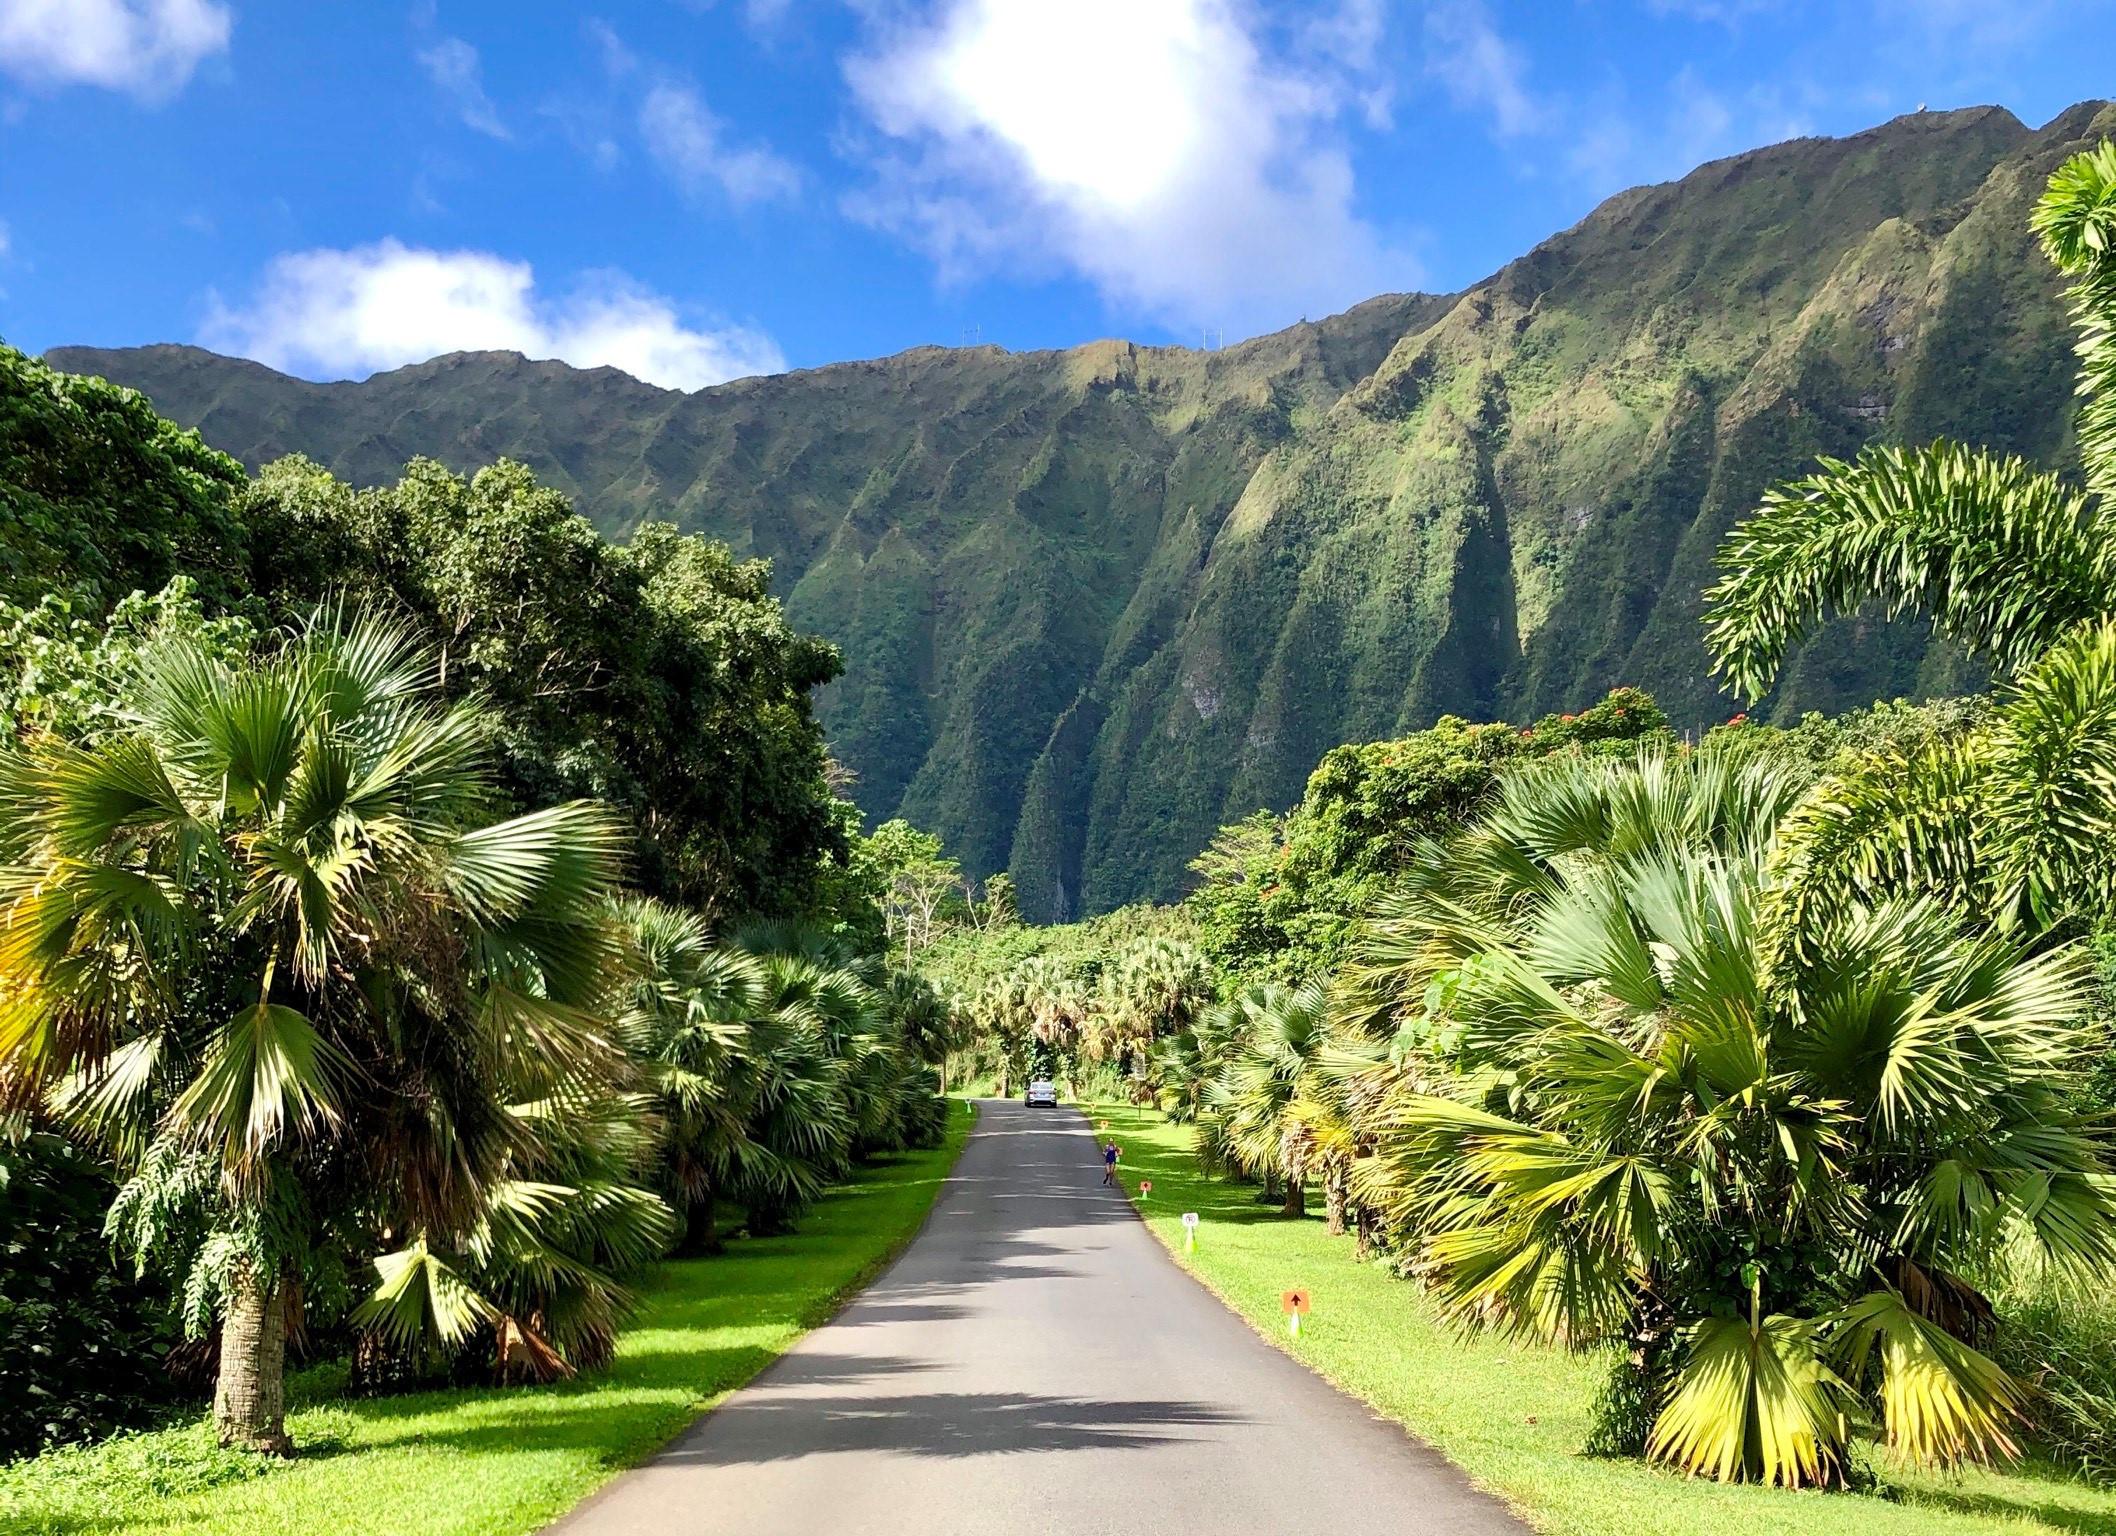 Private Oahu Nature Photo Tour